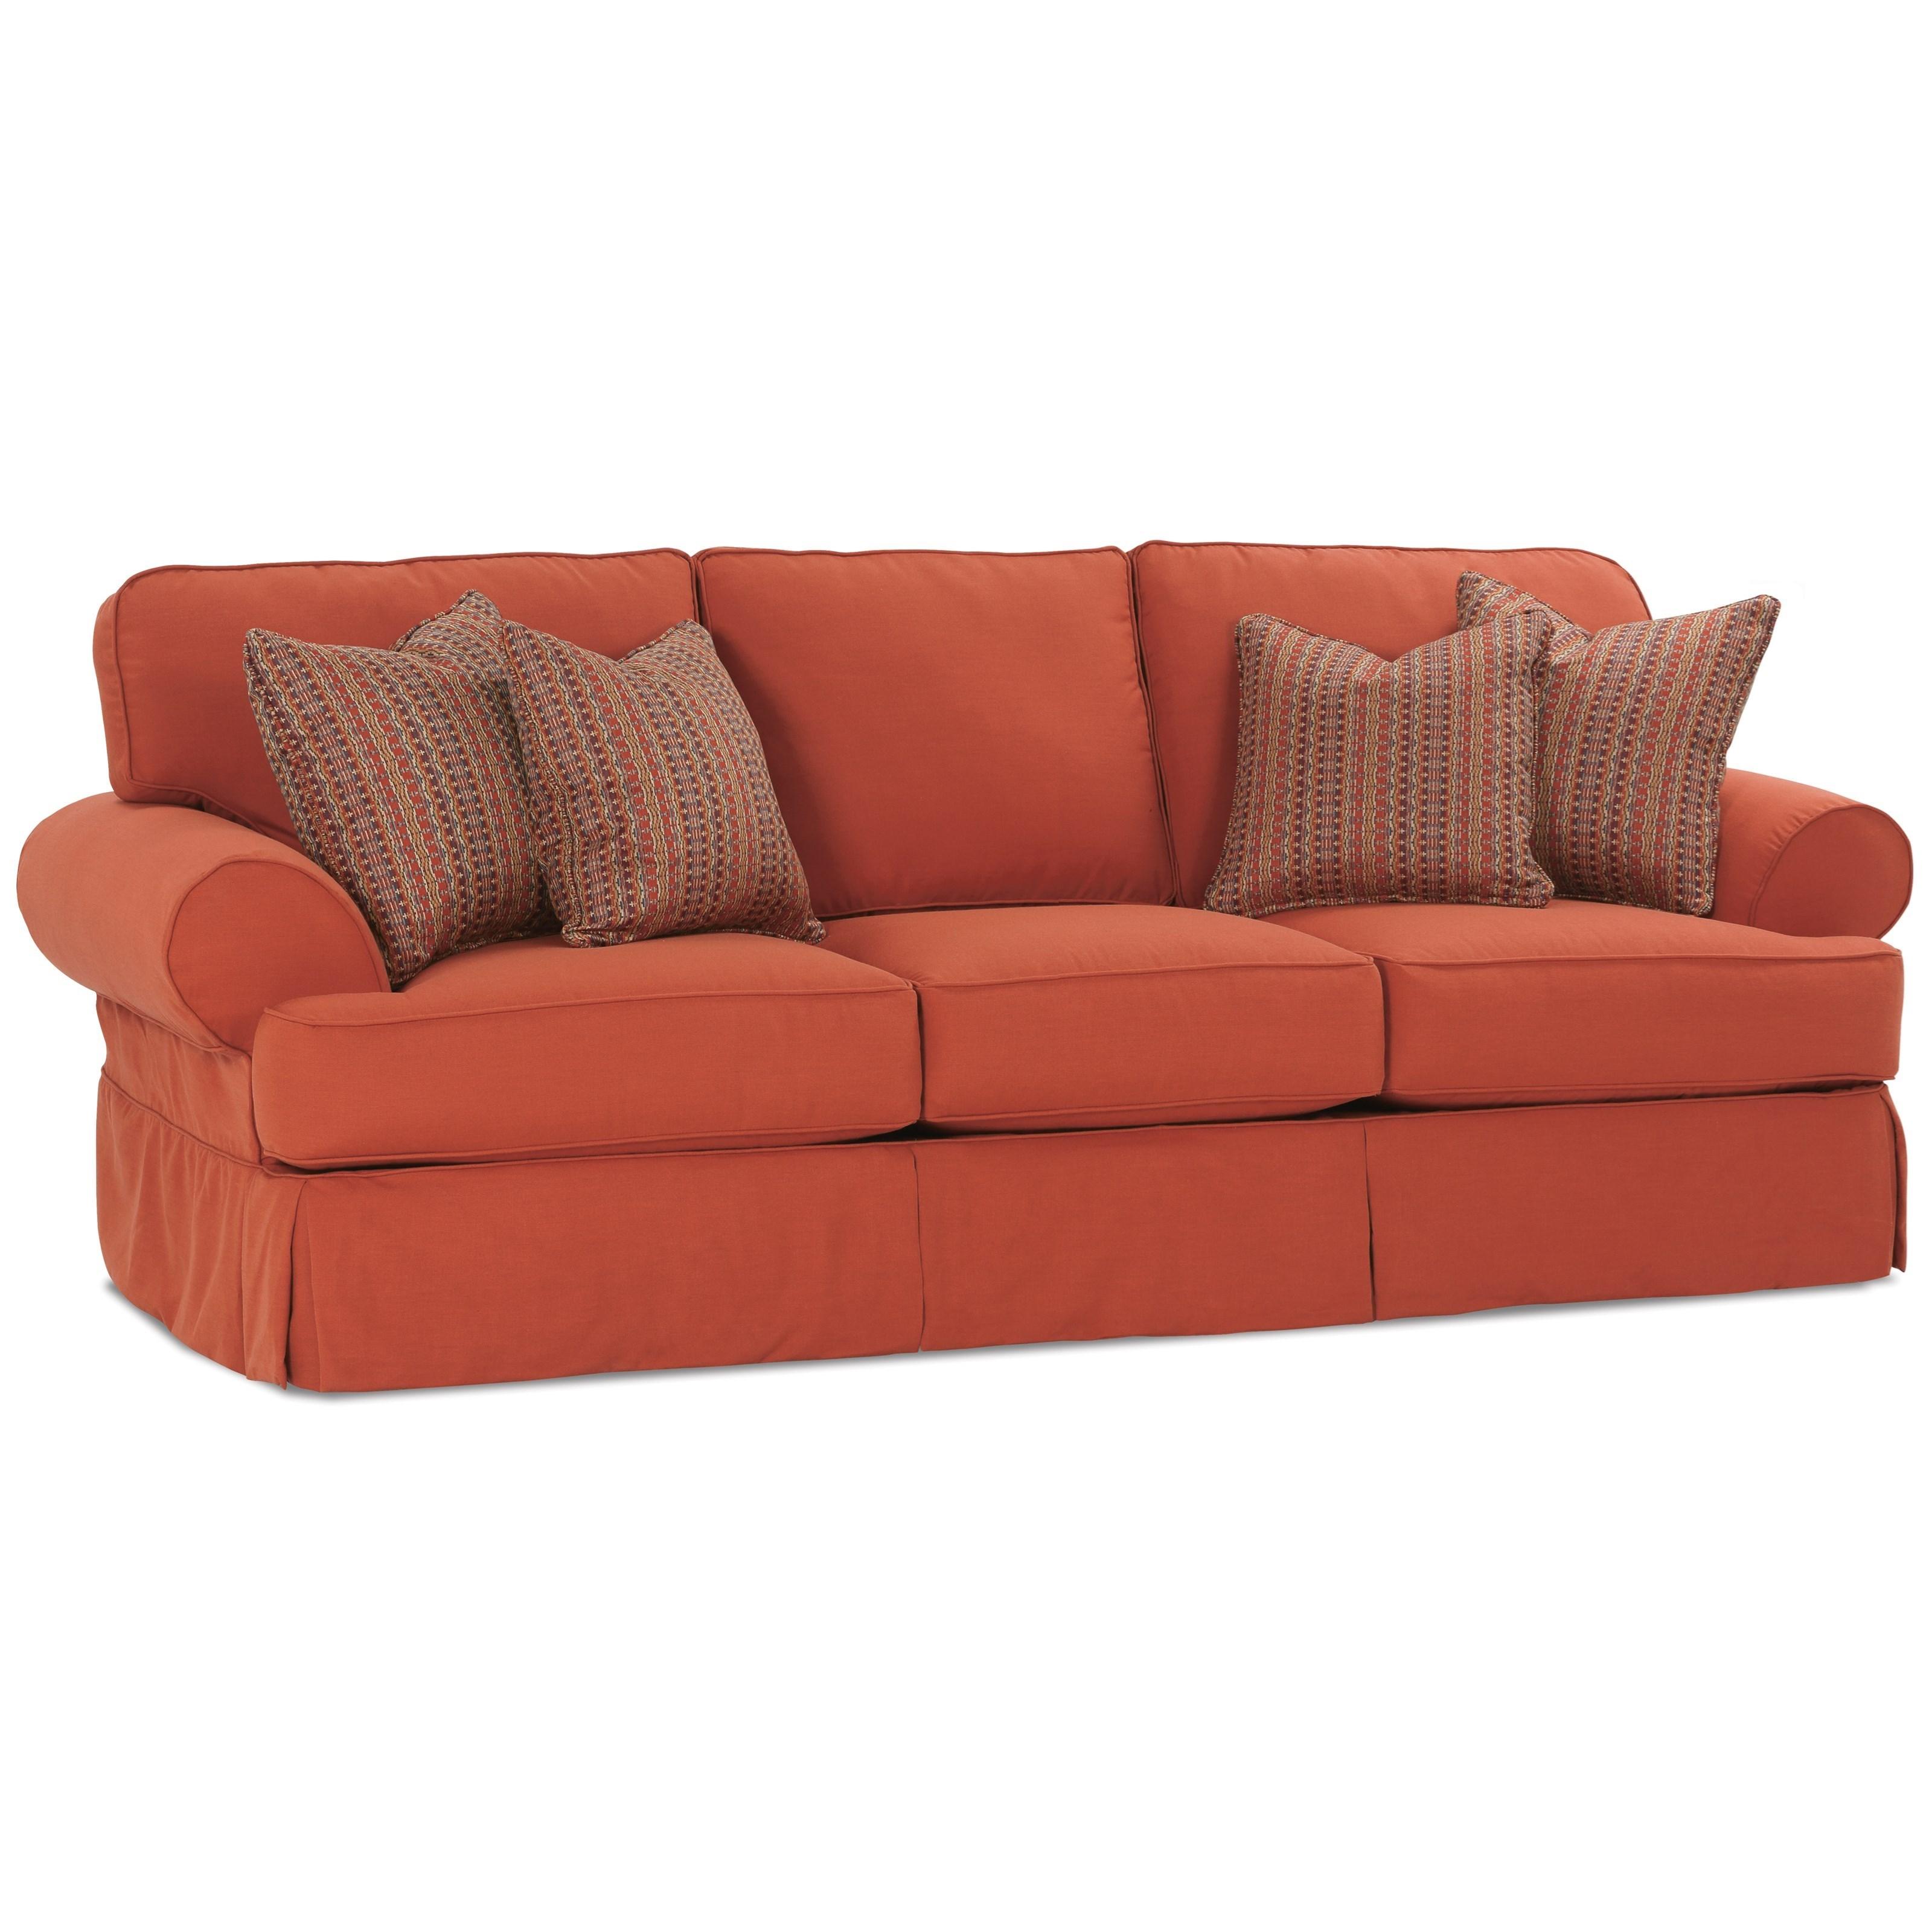 rowe slipcover sofa futon sleeper with storage addison traditional 3 seat and